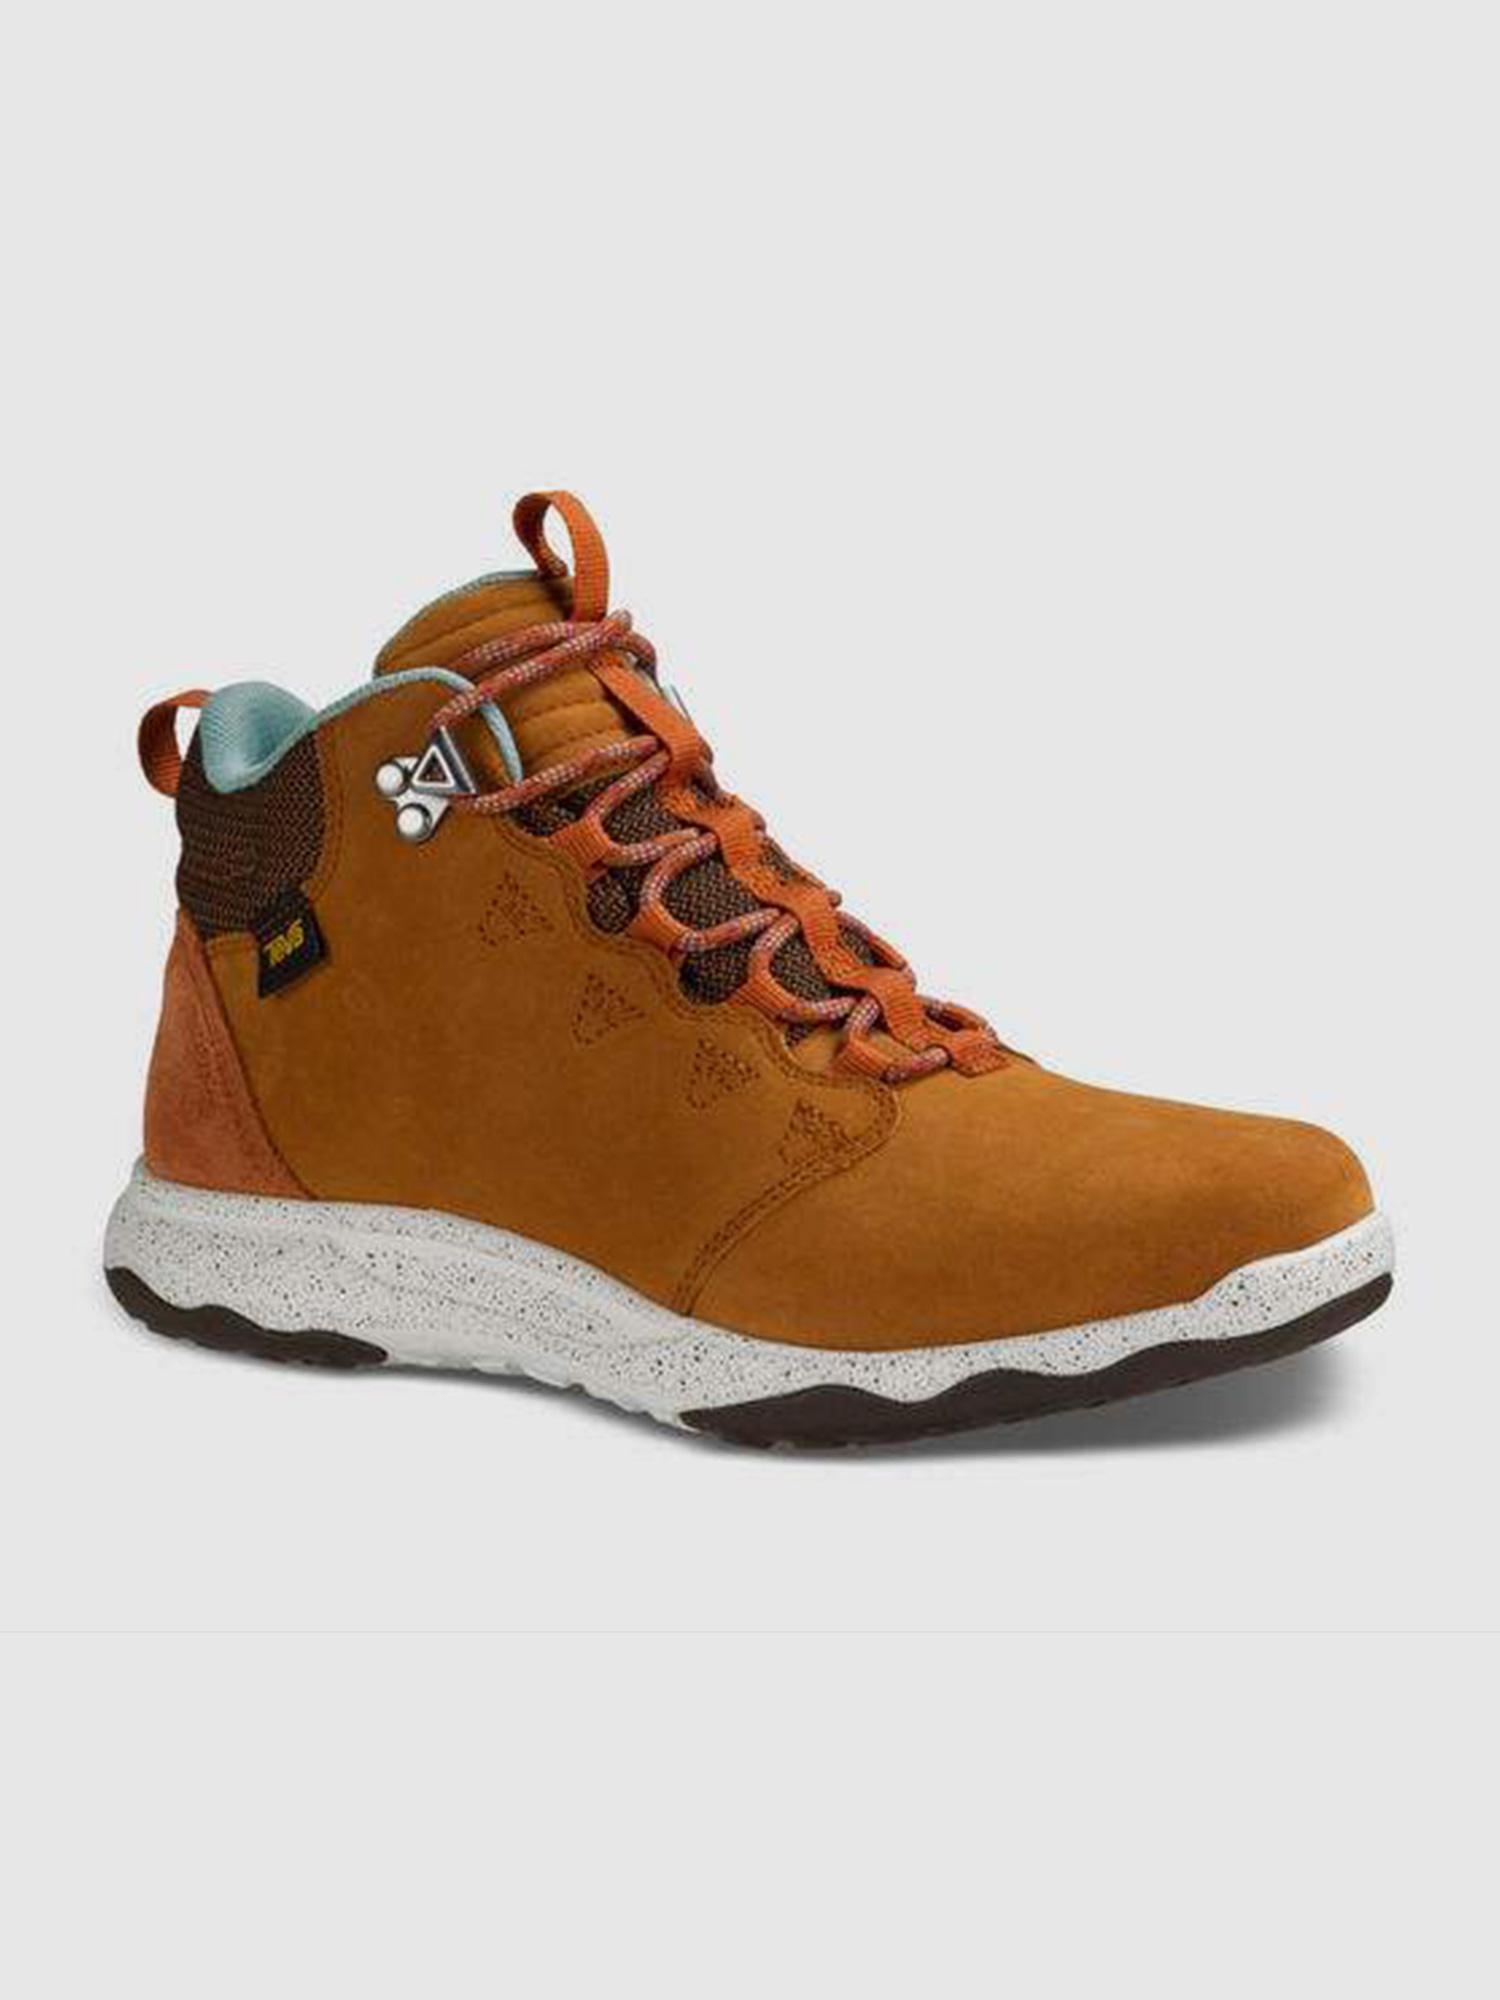 Teva Light Hiking Boots - $160